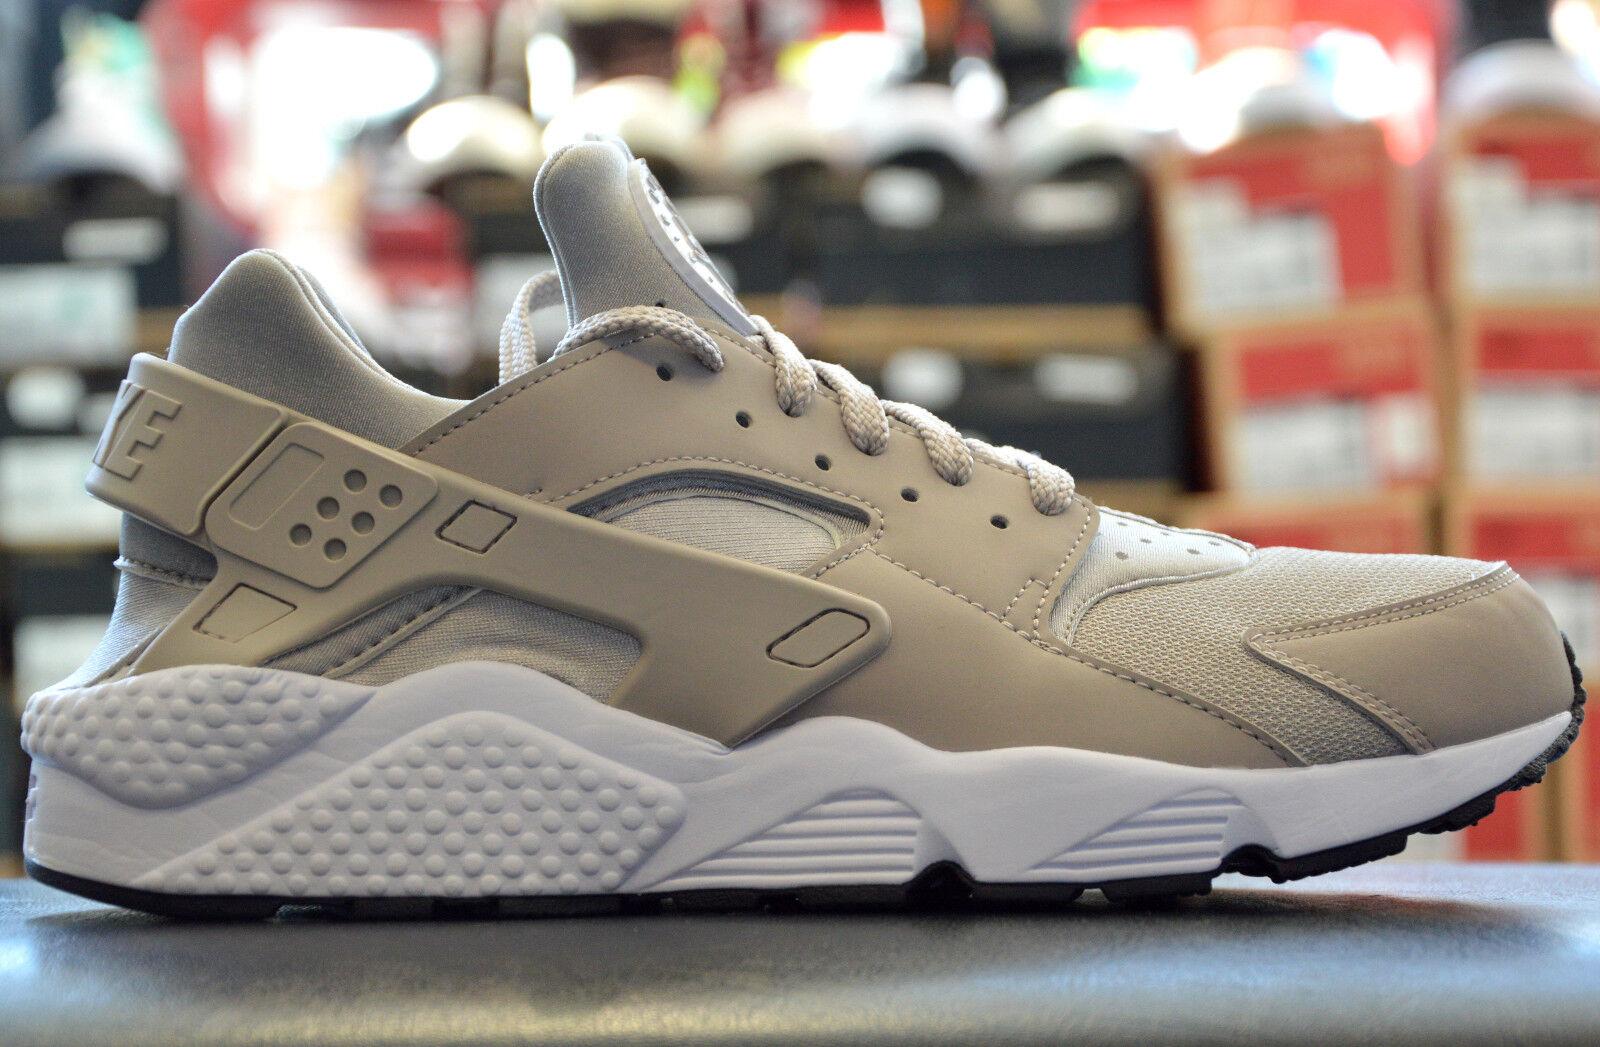 Nike huarache free premium zapatos caballero zapatillas cortos huarache free huarache marrón 44,5 caba42